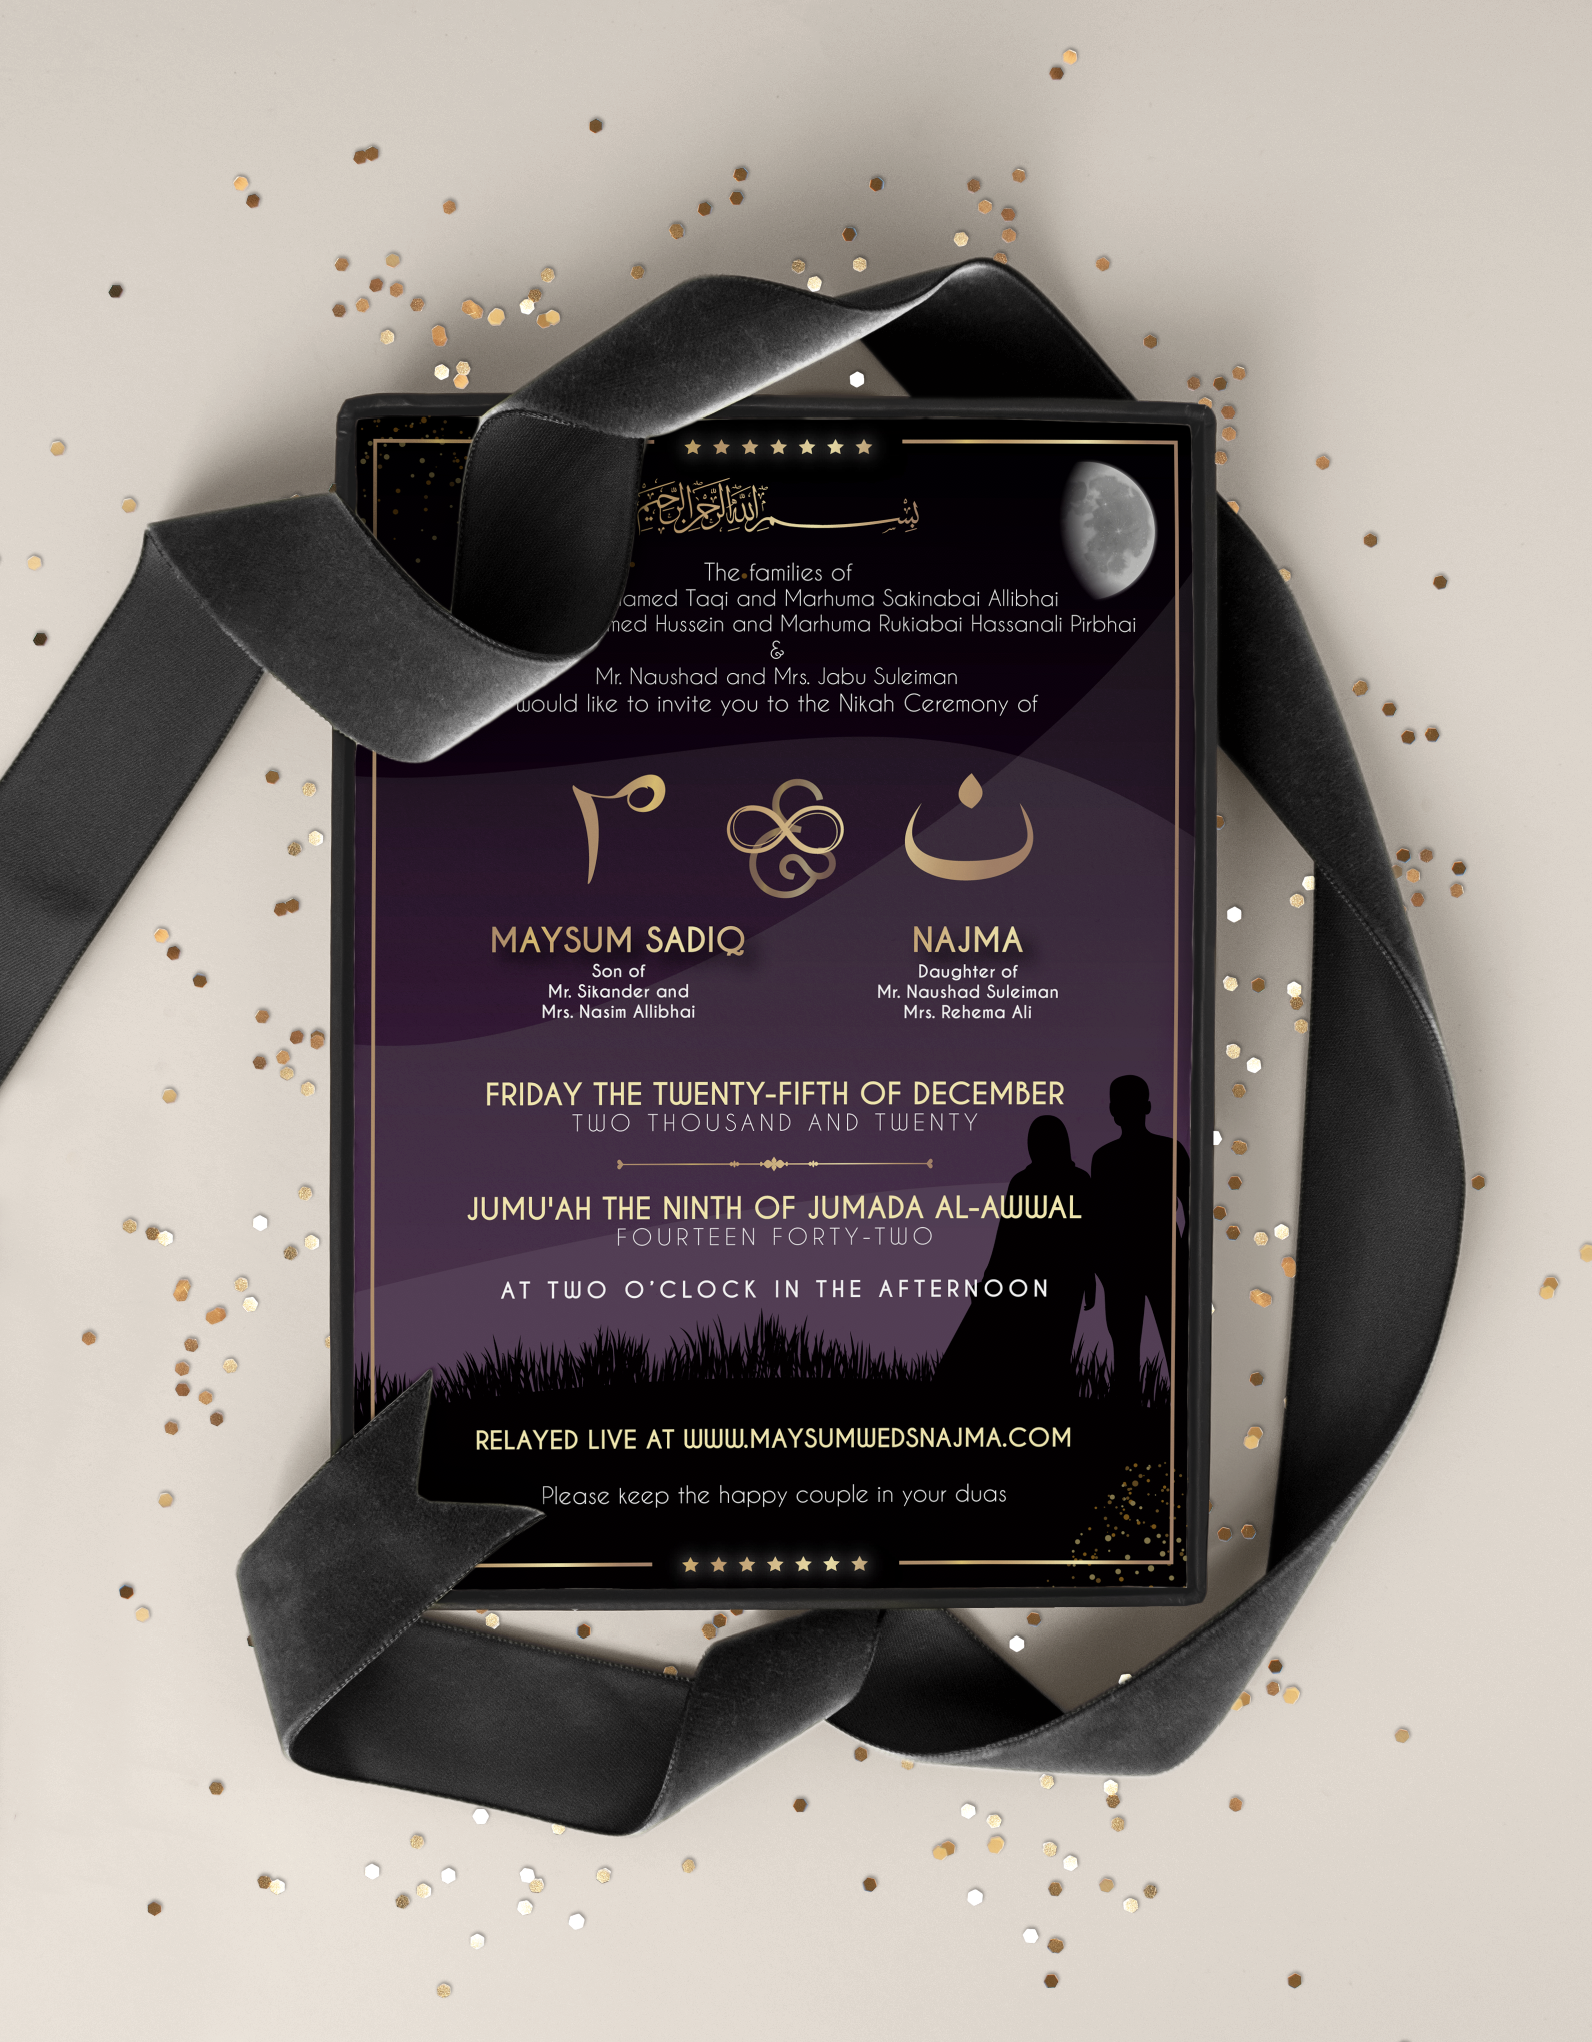 Maysum Sadiq Weds Najma – Wedding Invitation